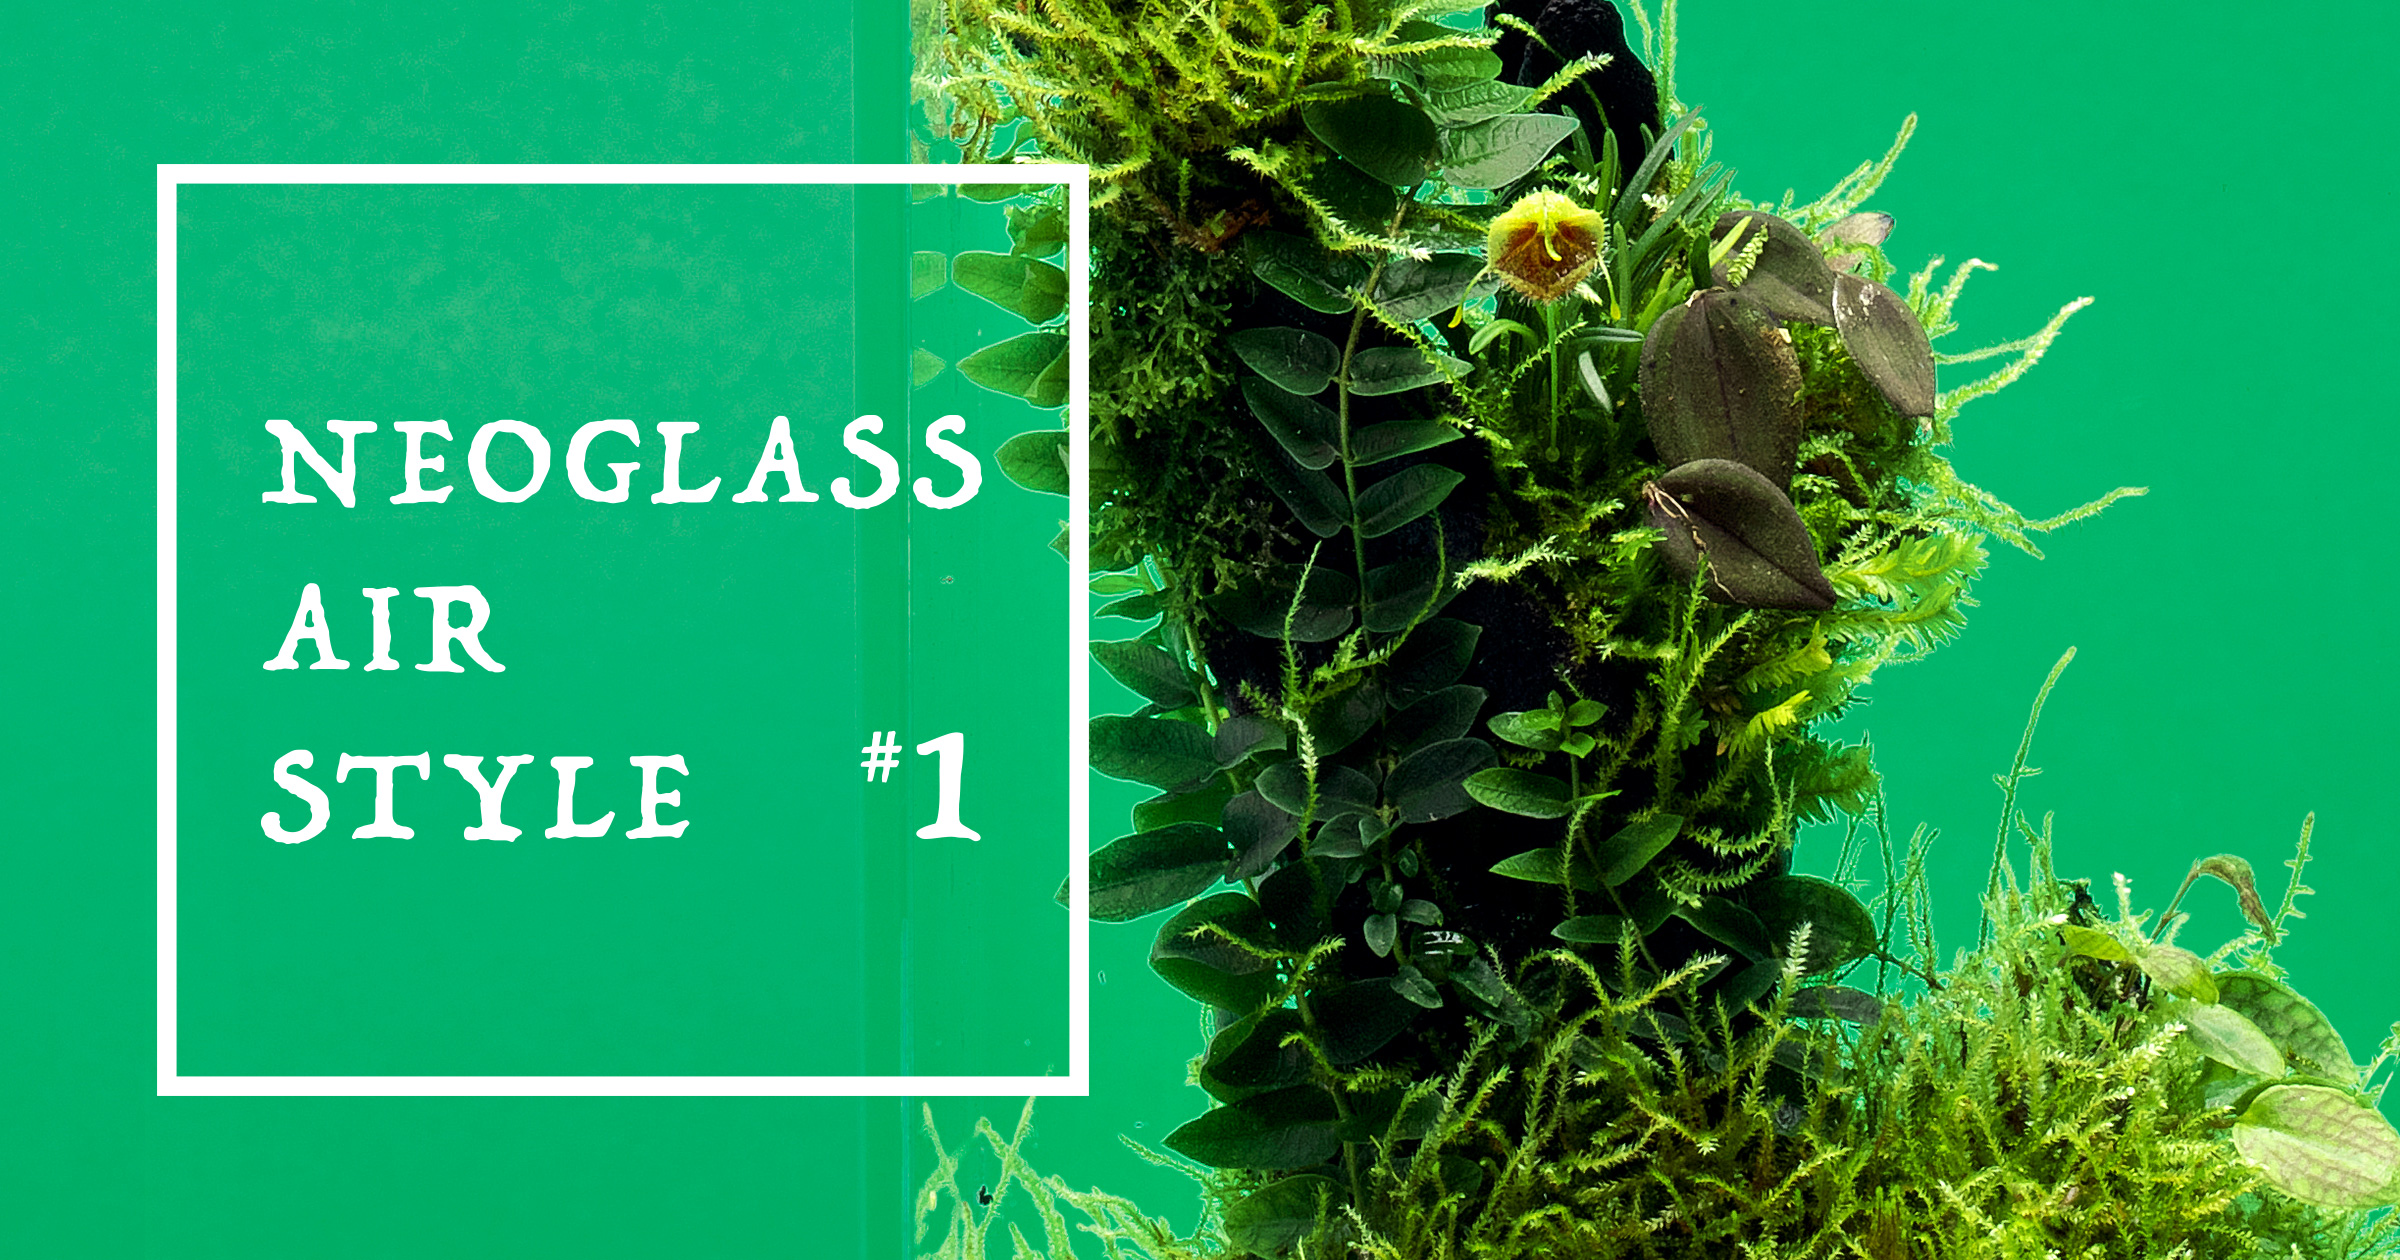 NEOGLASS AIR STYLE #1